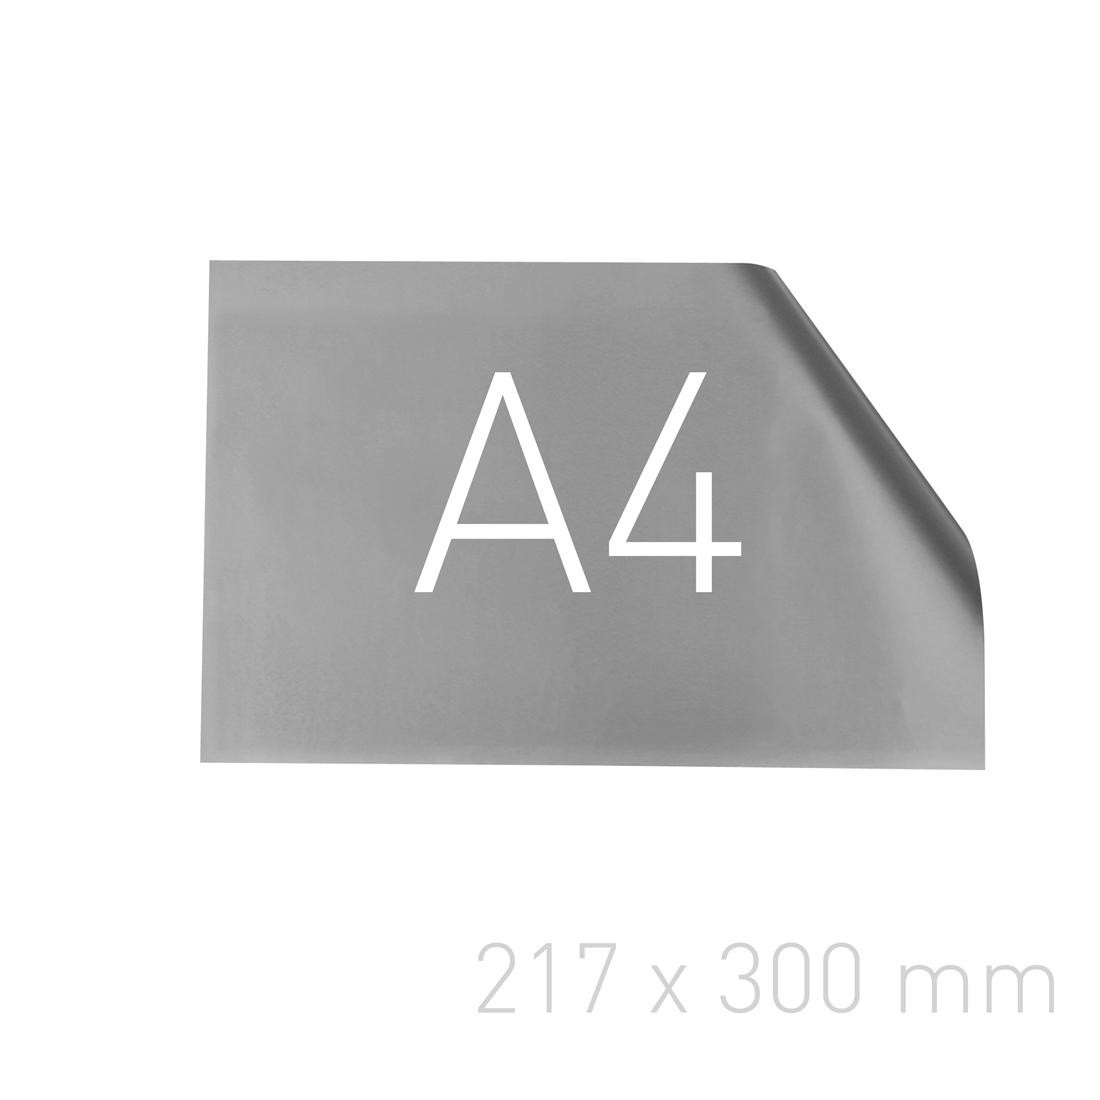 Papier posrebrzany - O.pouchCOVER PAPER 217 x 300 mm (A4 orientacja pozioma) - srebrny - 25 sztuk